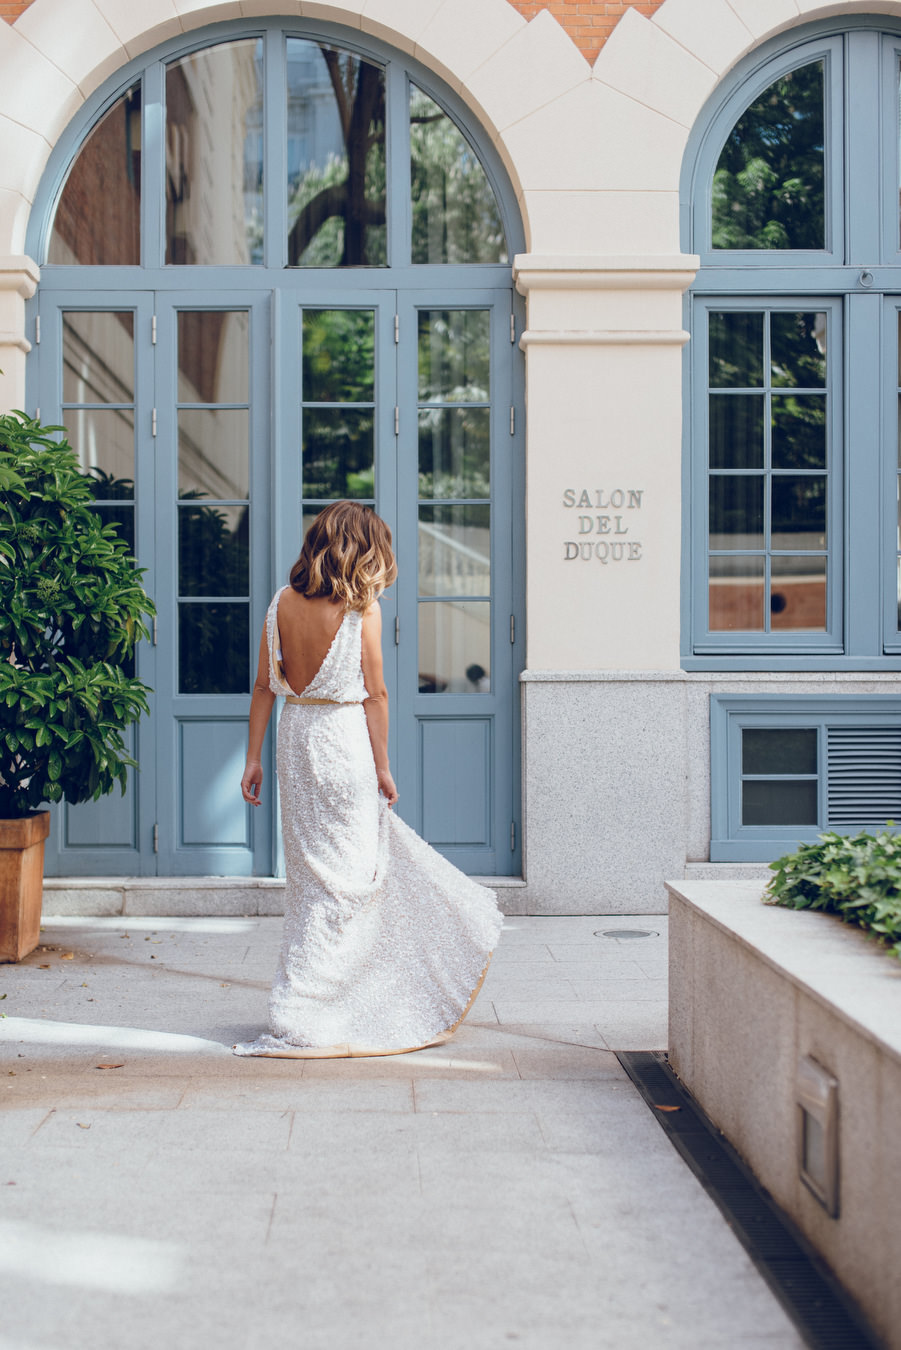 calista-one-lista-de-bodas-online-blog-de-bodas-bossanova-looks-invitadas-pepe-botella-13